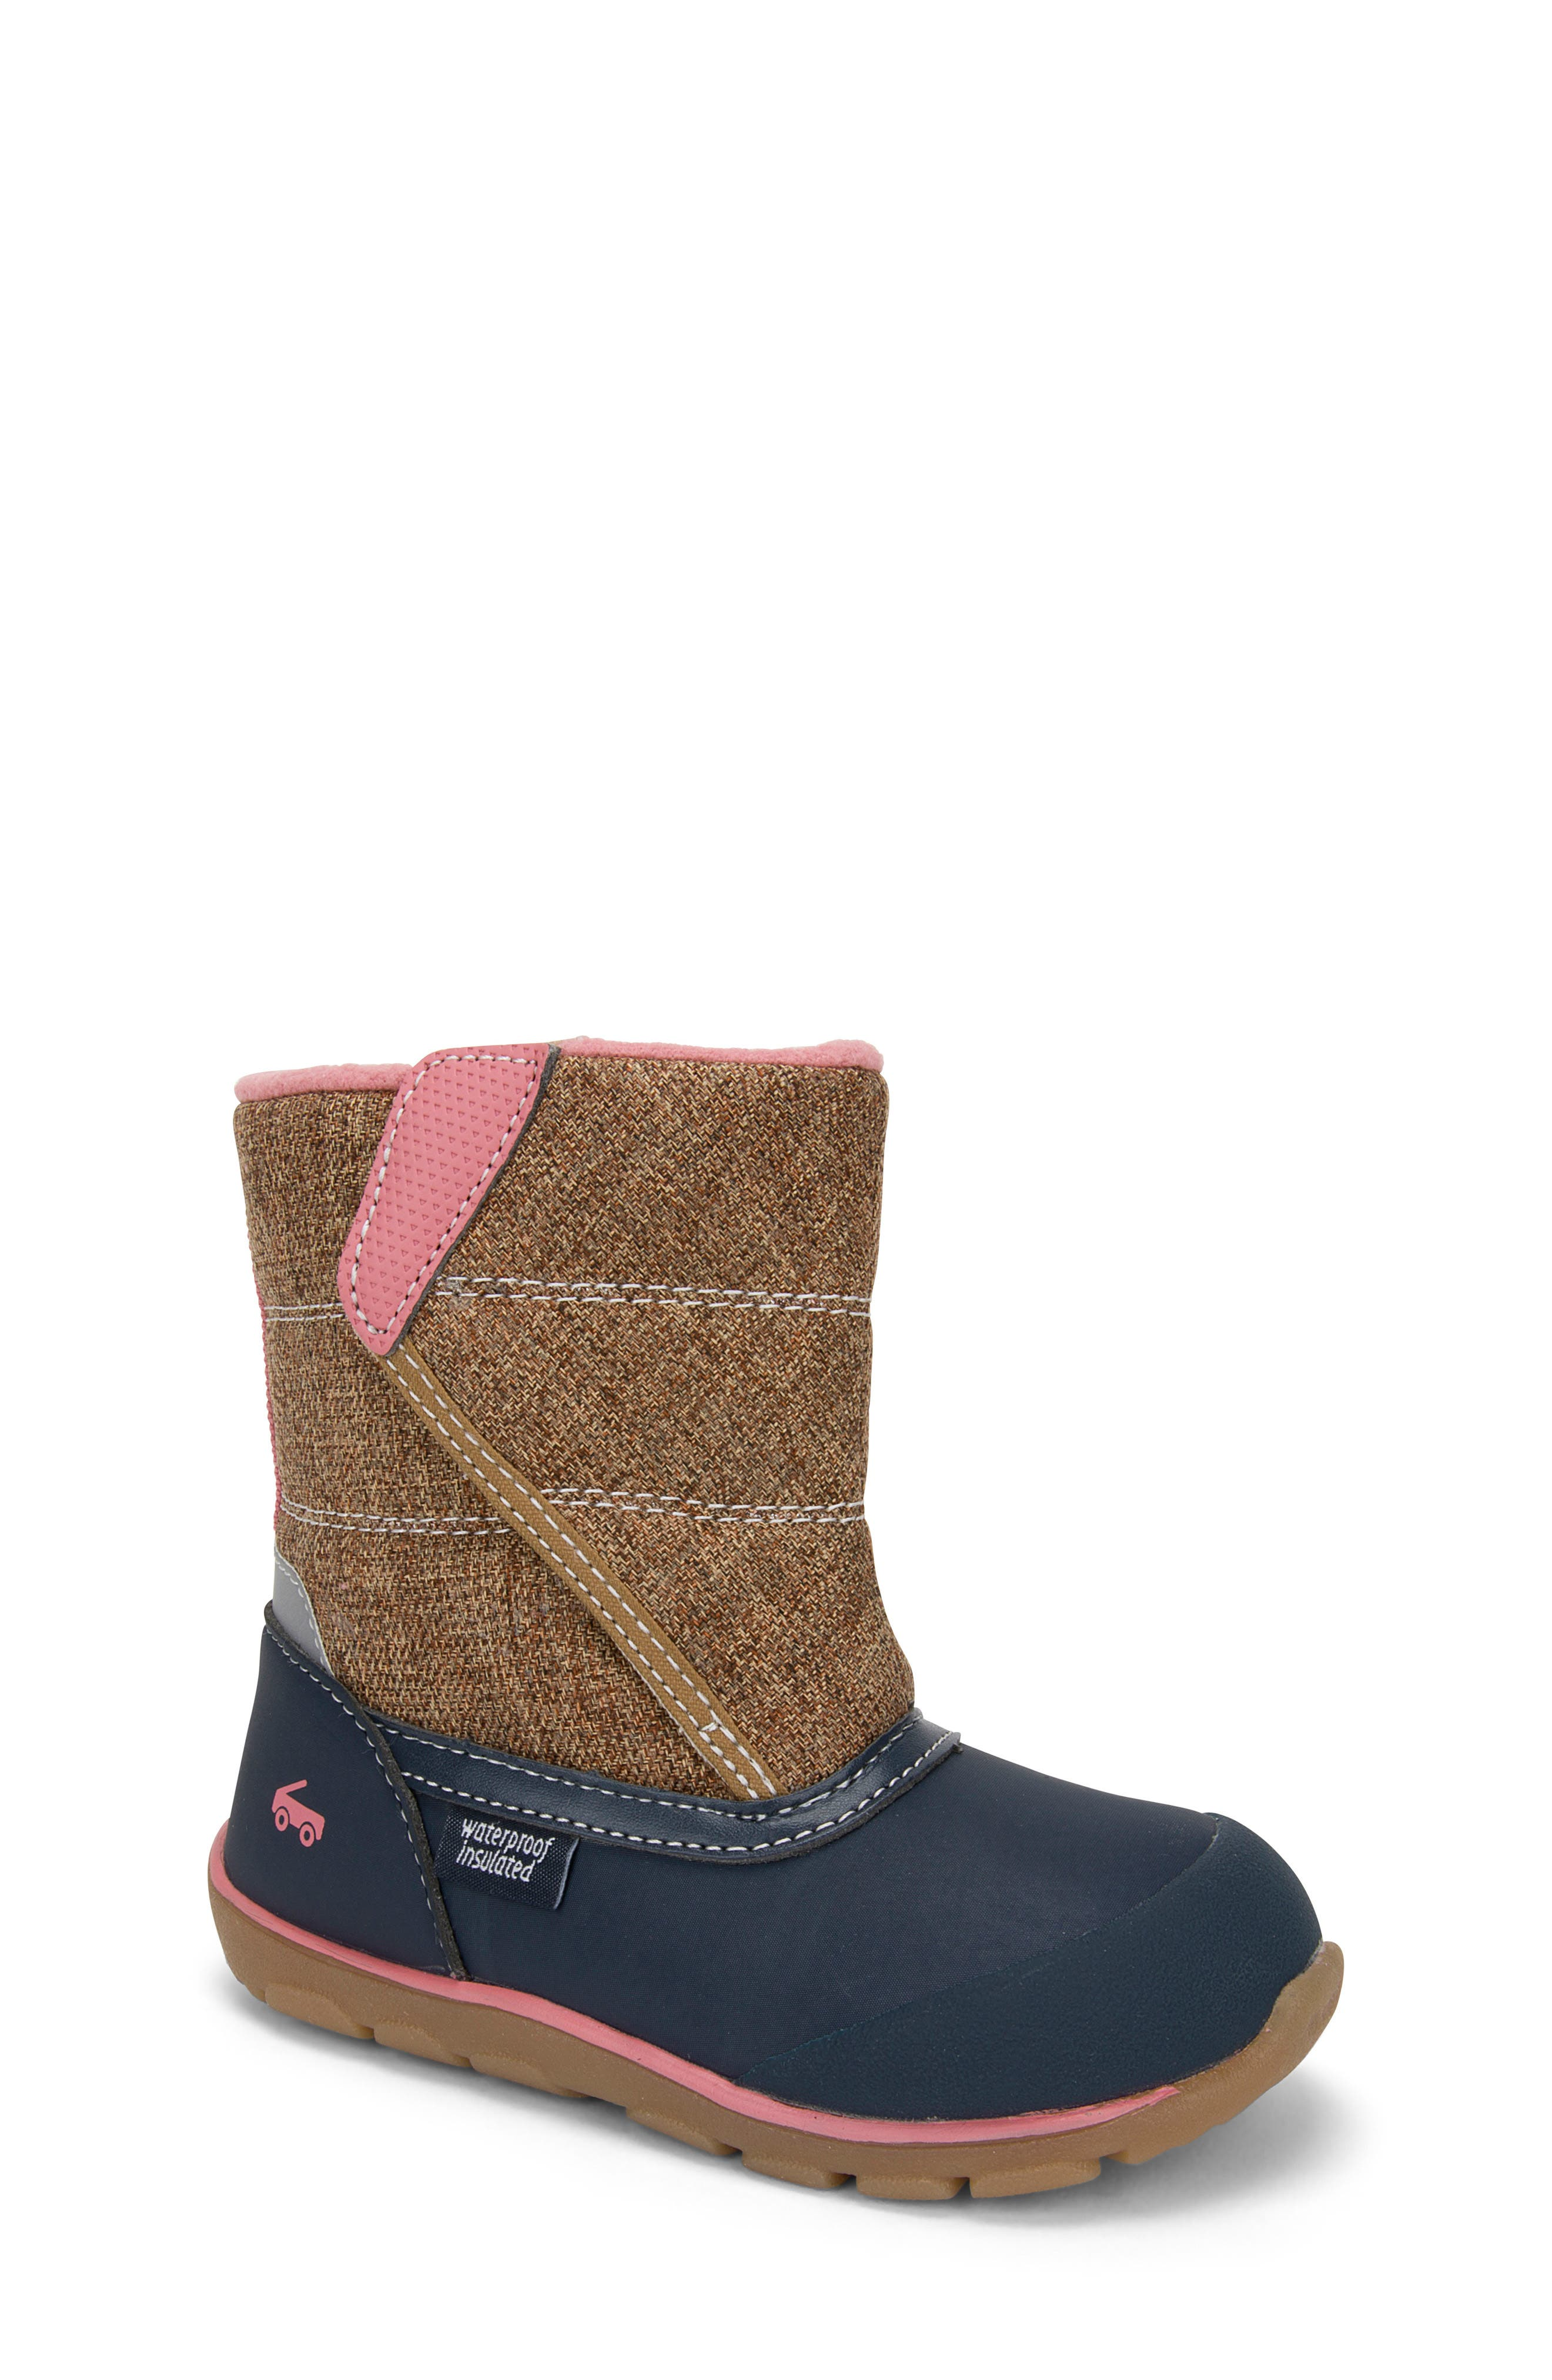 SEE KAI RUN,                             Baker Waterproof Insulated Boot,                             Main thumbnail 1, color,                             200